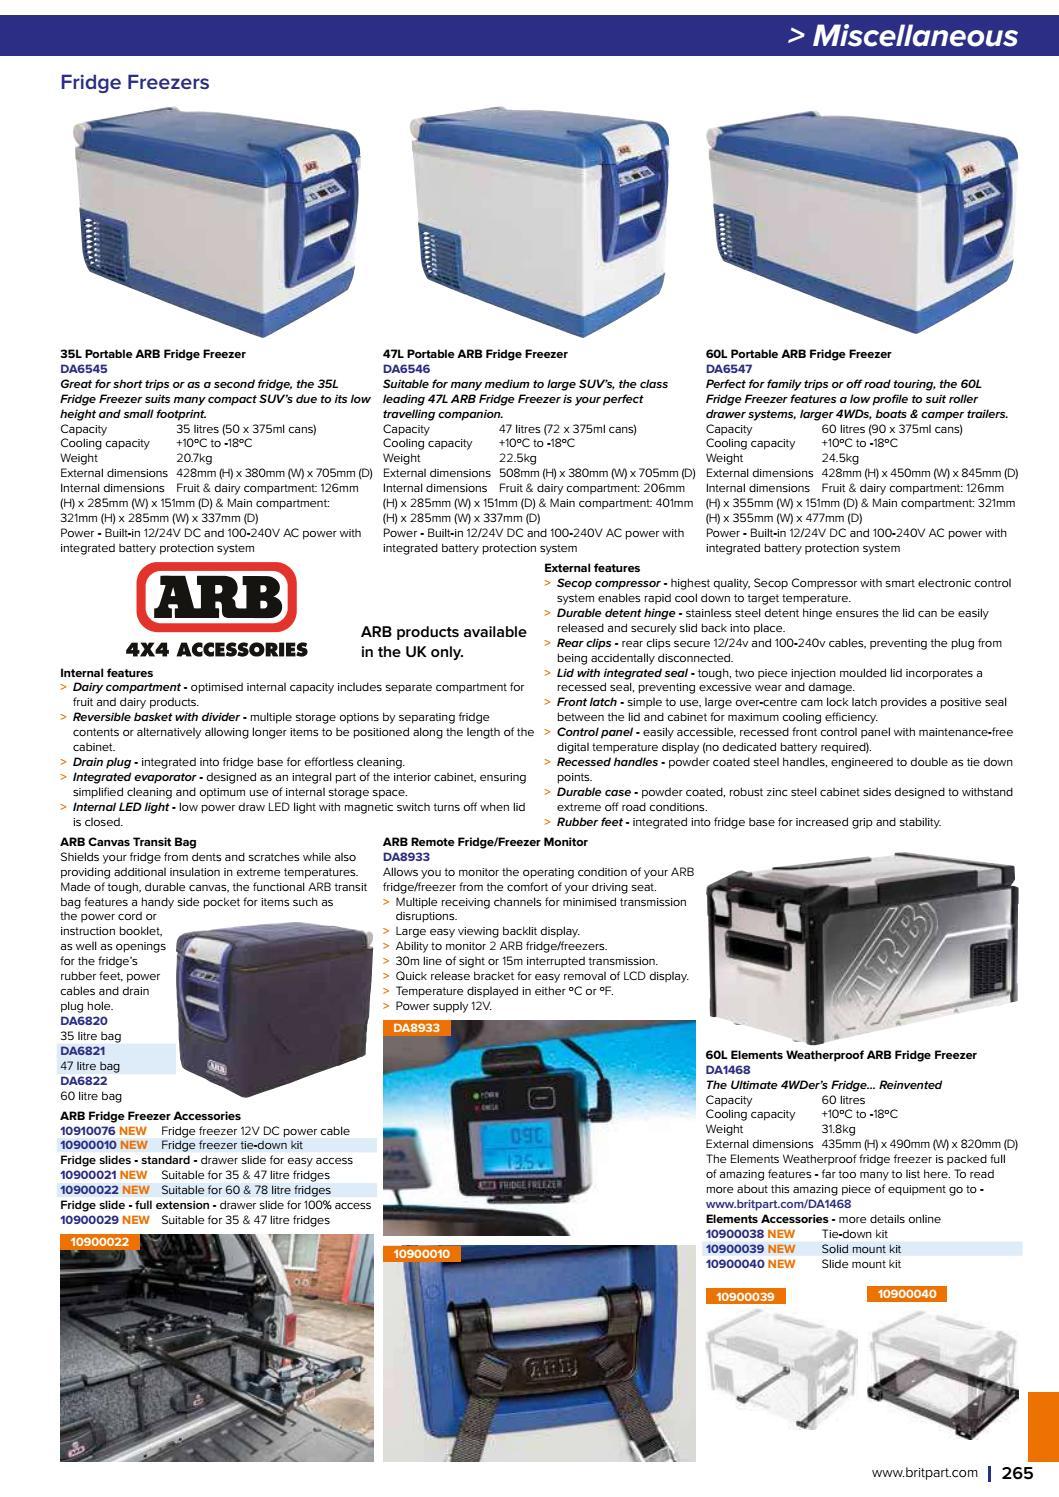 ARB 10910076 Fridge Freezer 12//24V DC Power Cord with Locking Plug